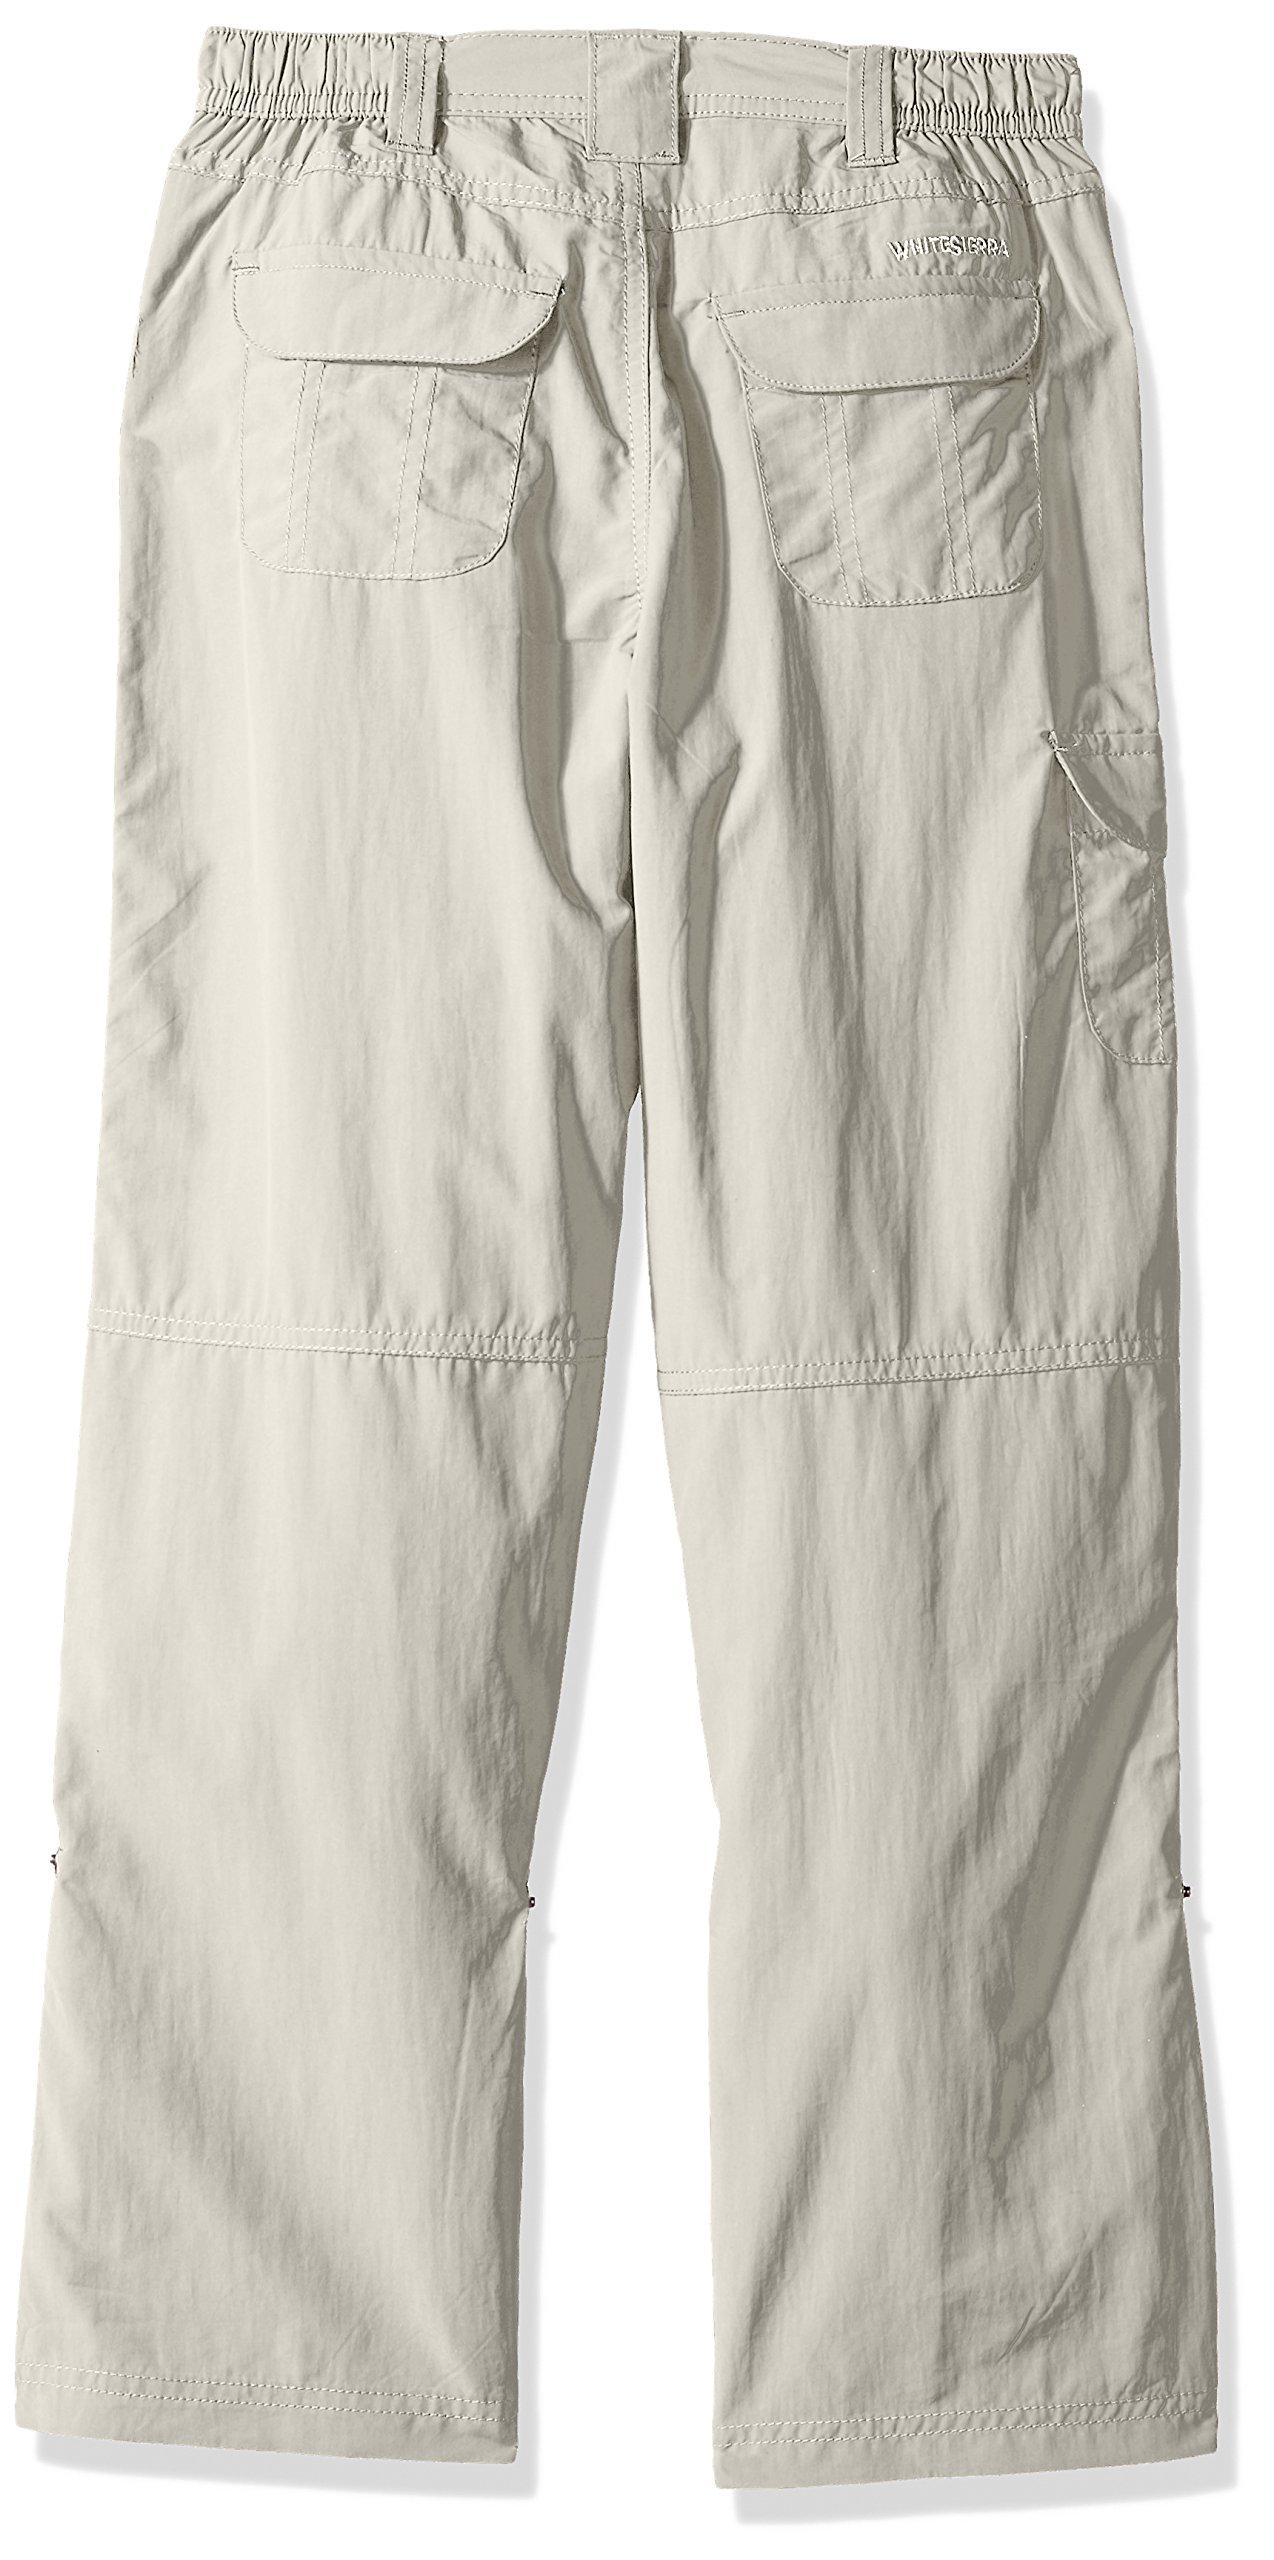 White Sierra Girls Pt. Roll Up Pants, Pale Taupe, Medium by White Sierra (Image #2)